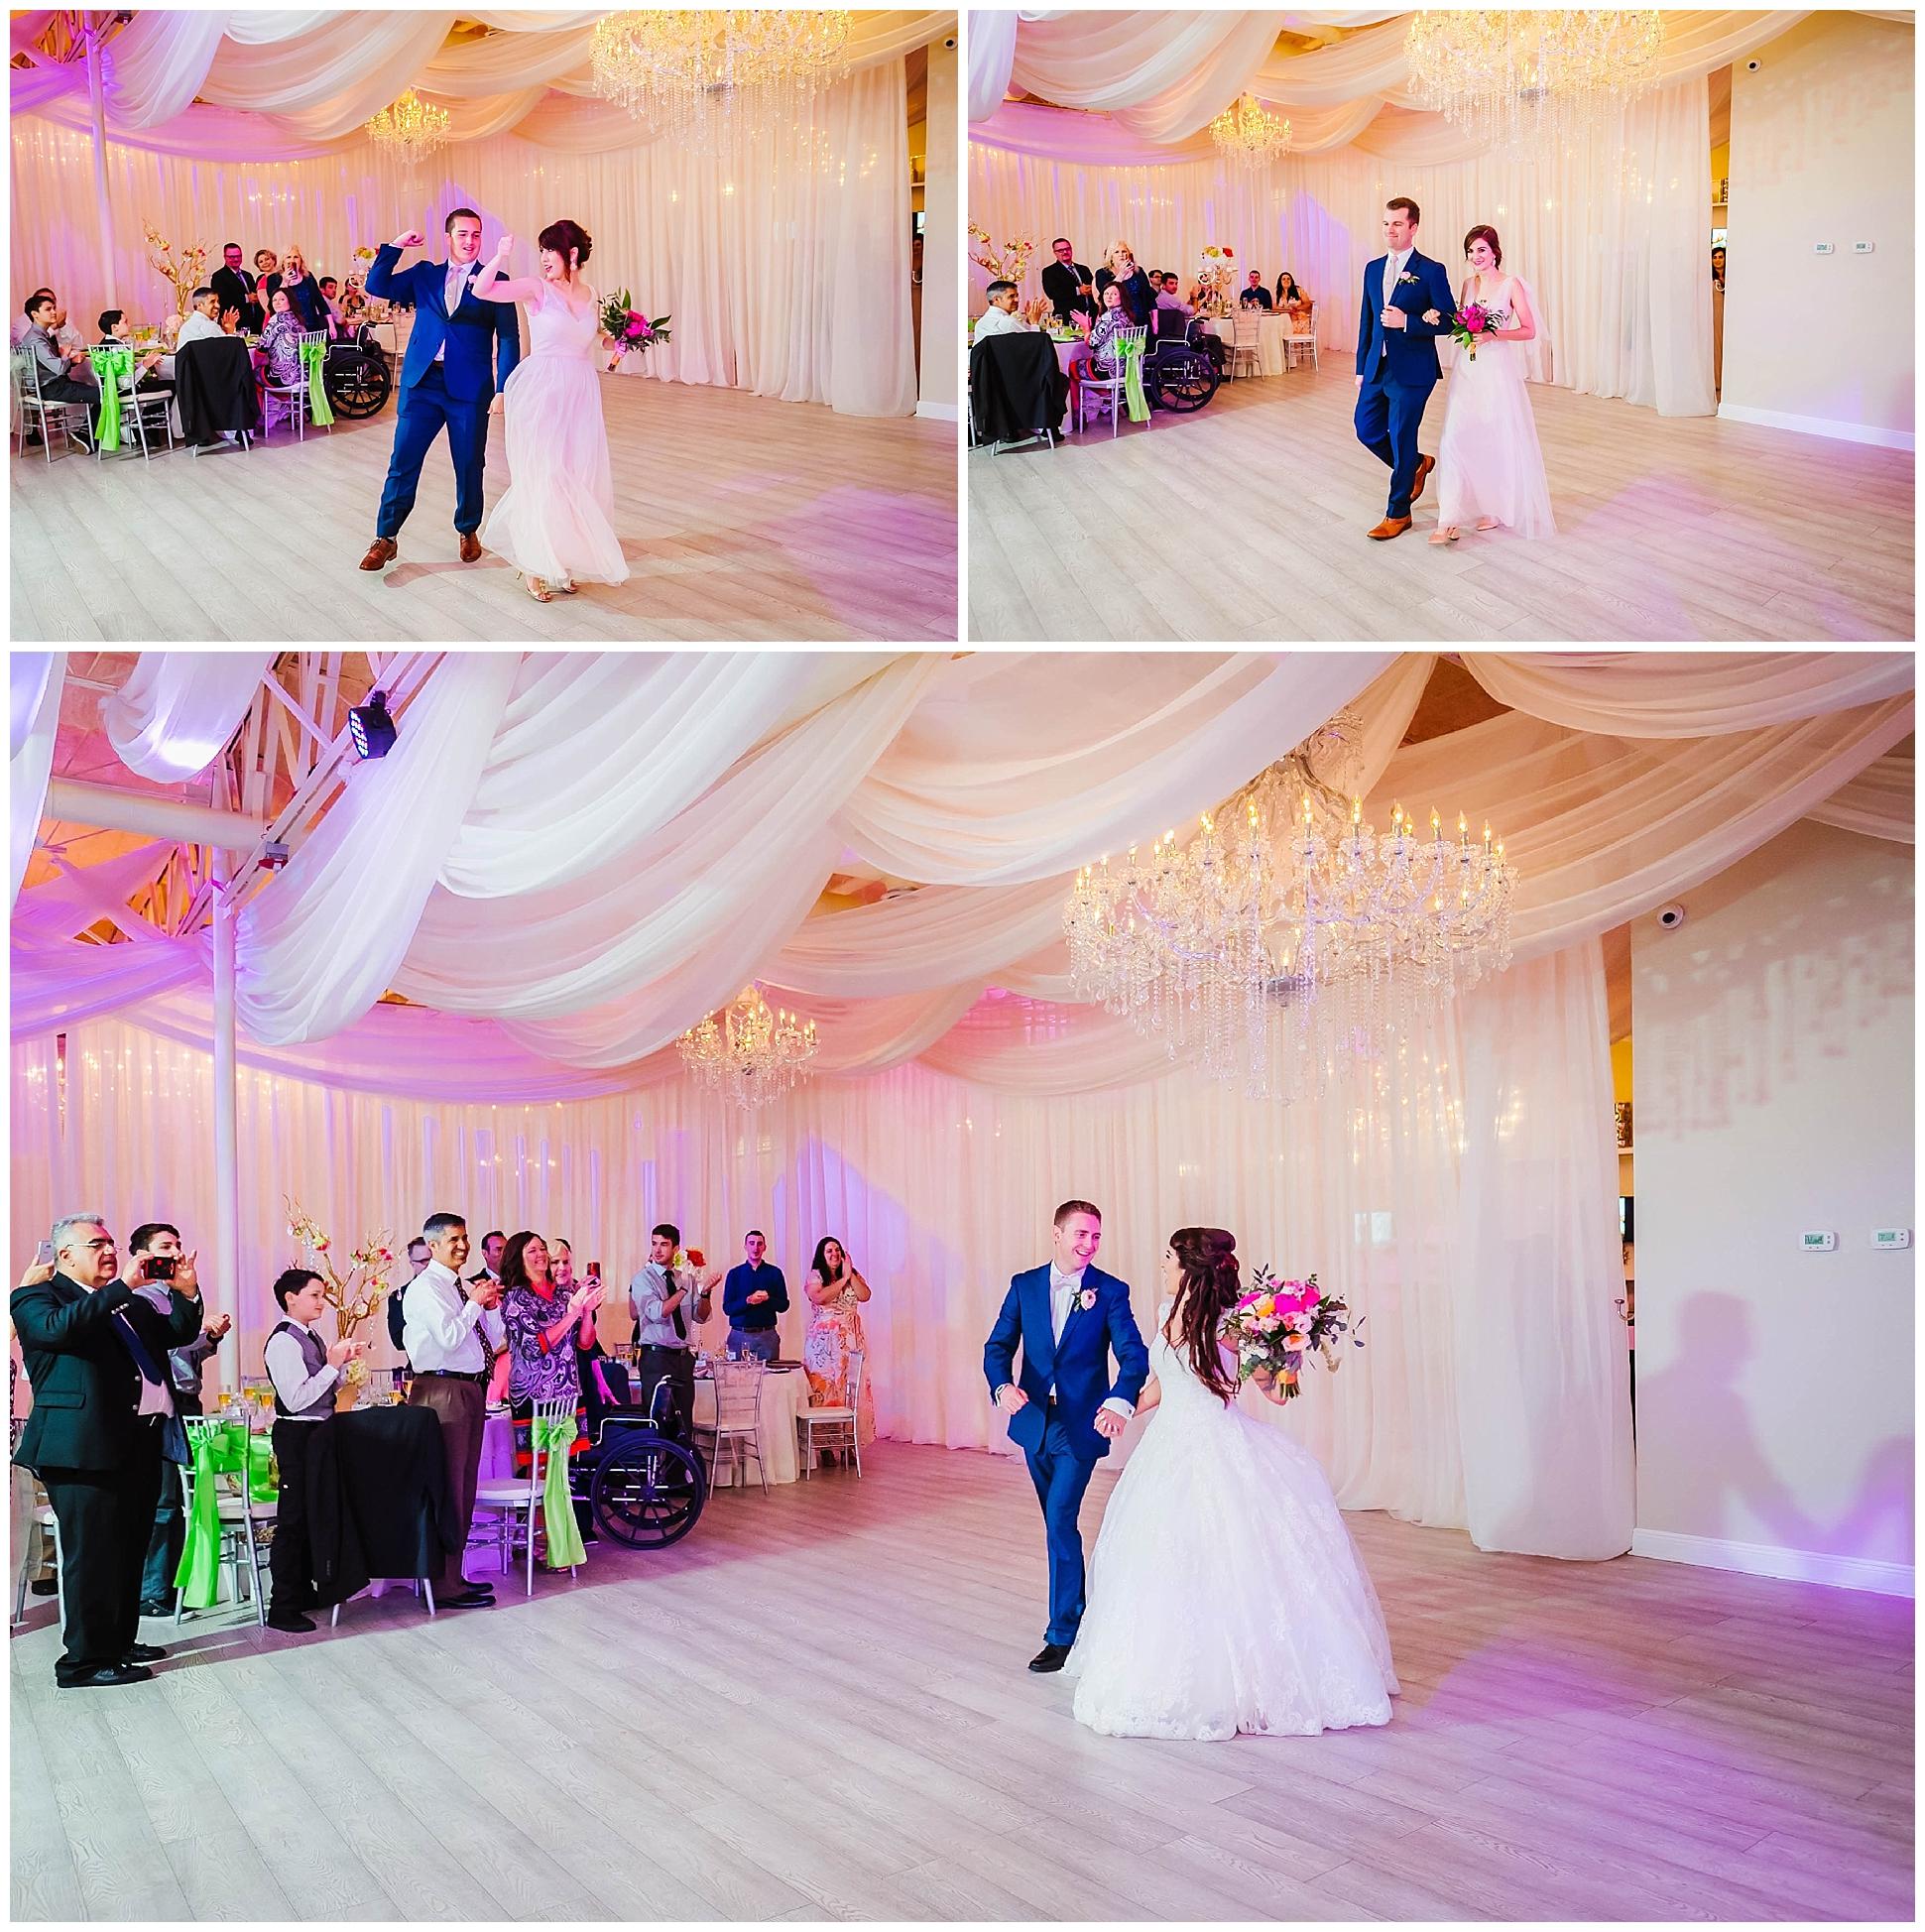 st-pete-wedding-photographer-sunken-gardens-crystal-ballroom-princess-dancer_0186.jpg